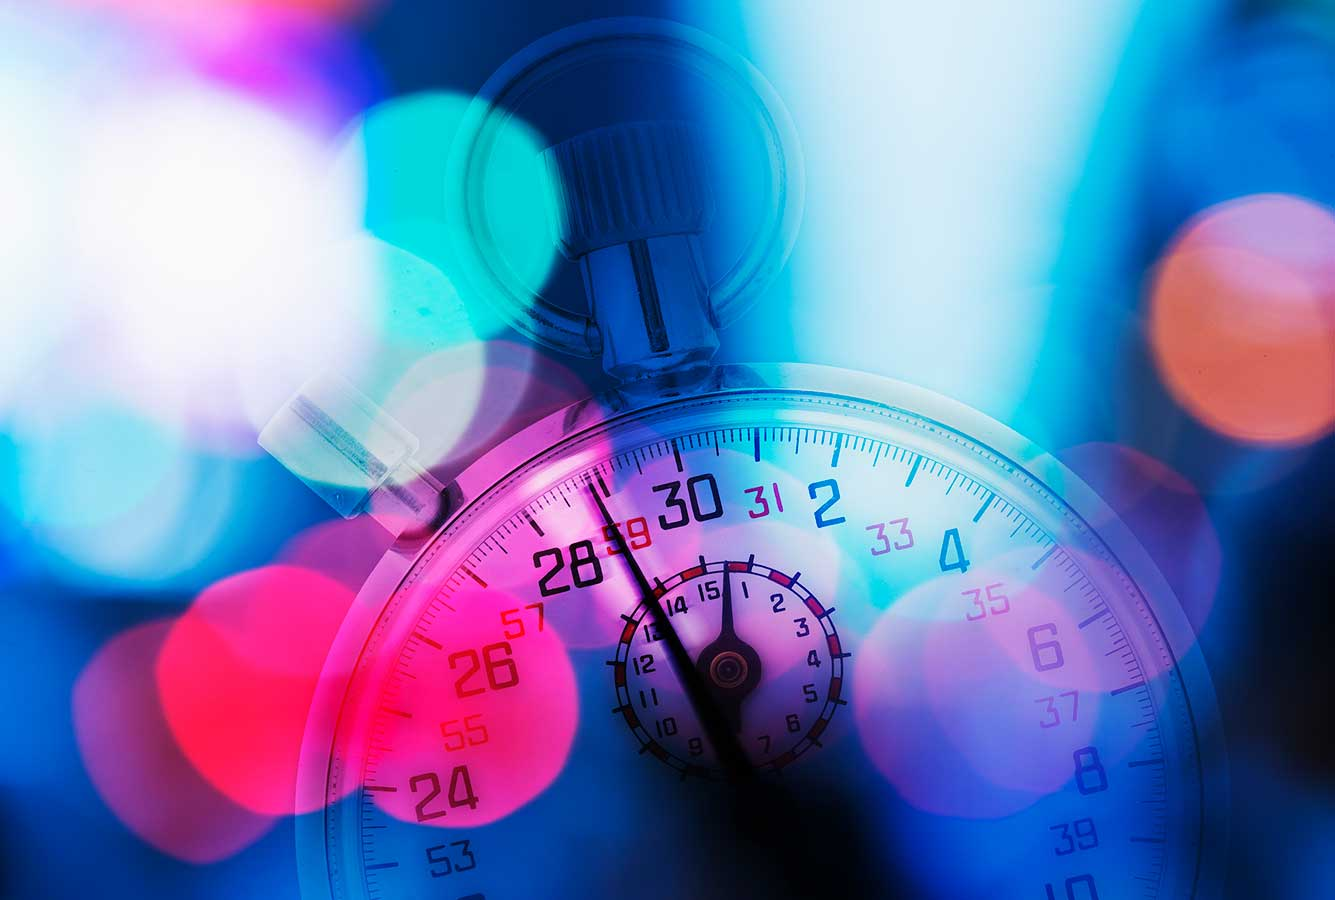 It's-Time-stopwatch-web